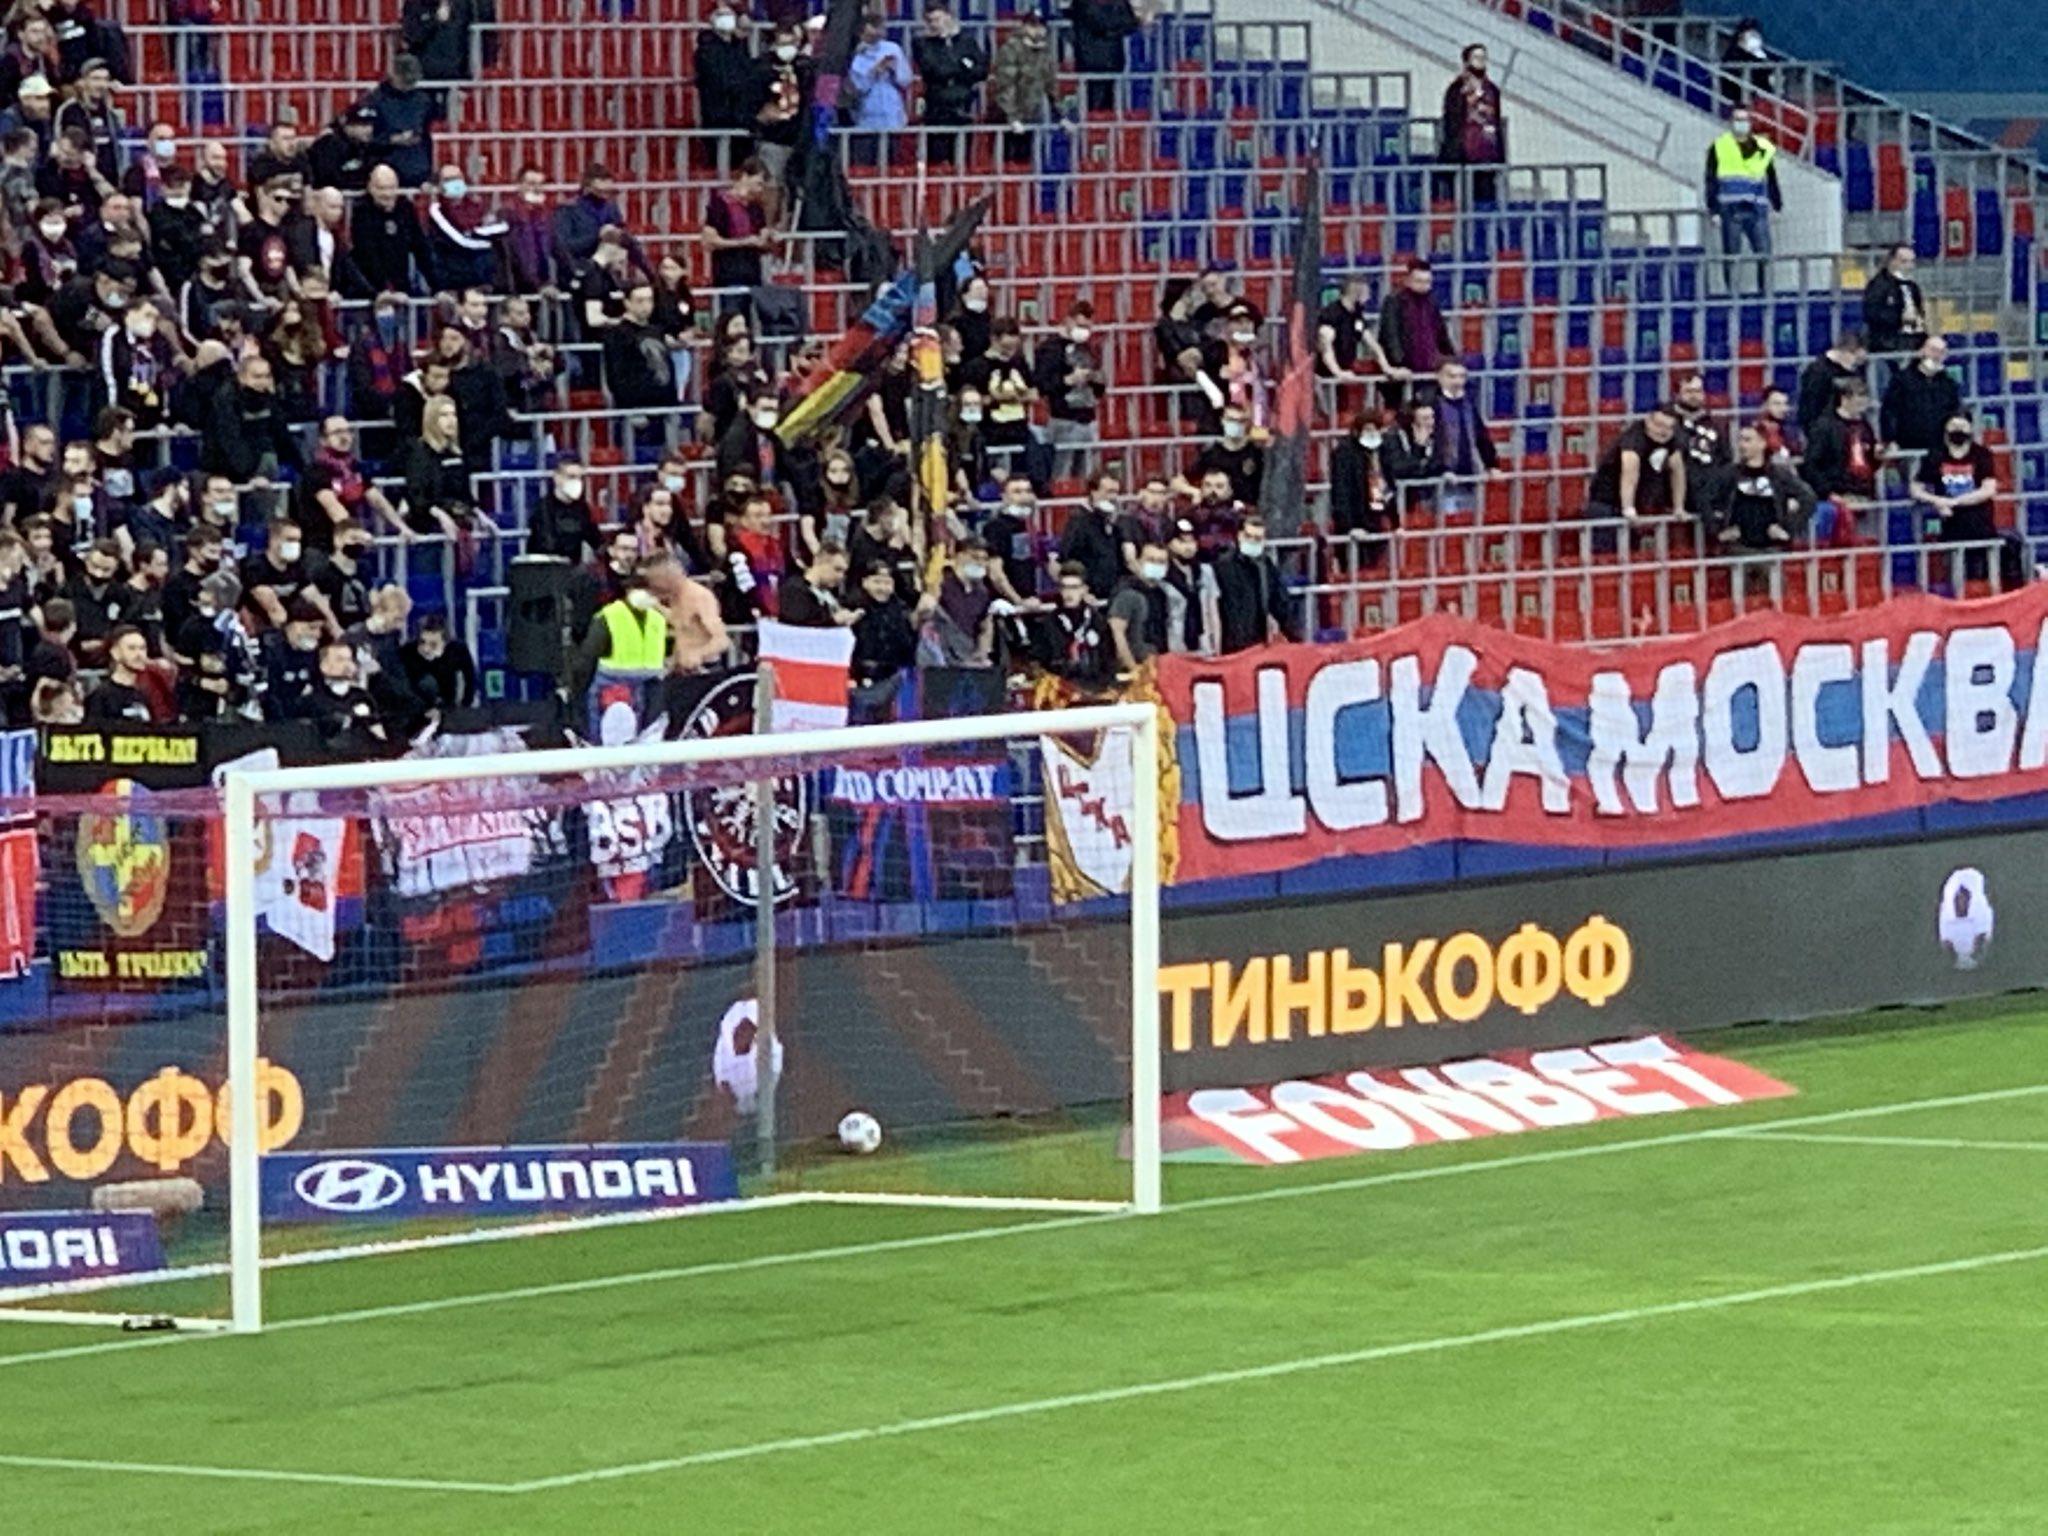 Фанату ЦСКА на год запретили посещать матчи за флаг белорусского протеста